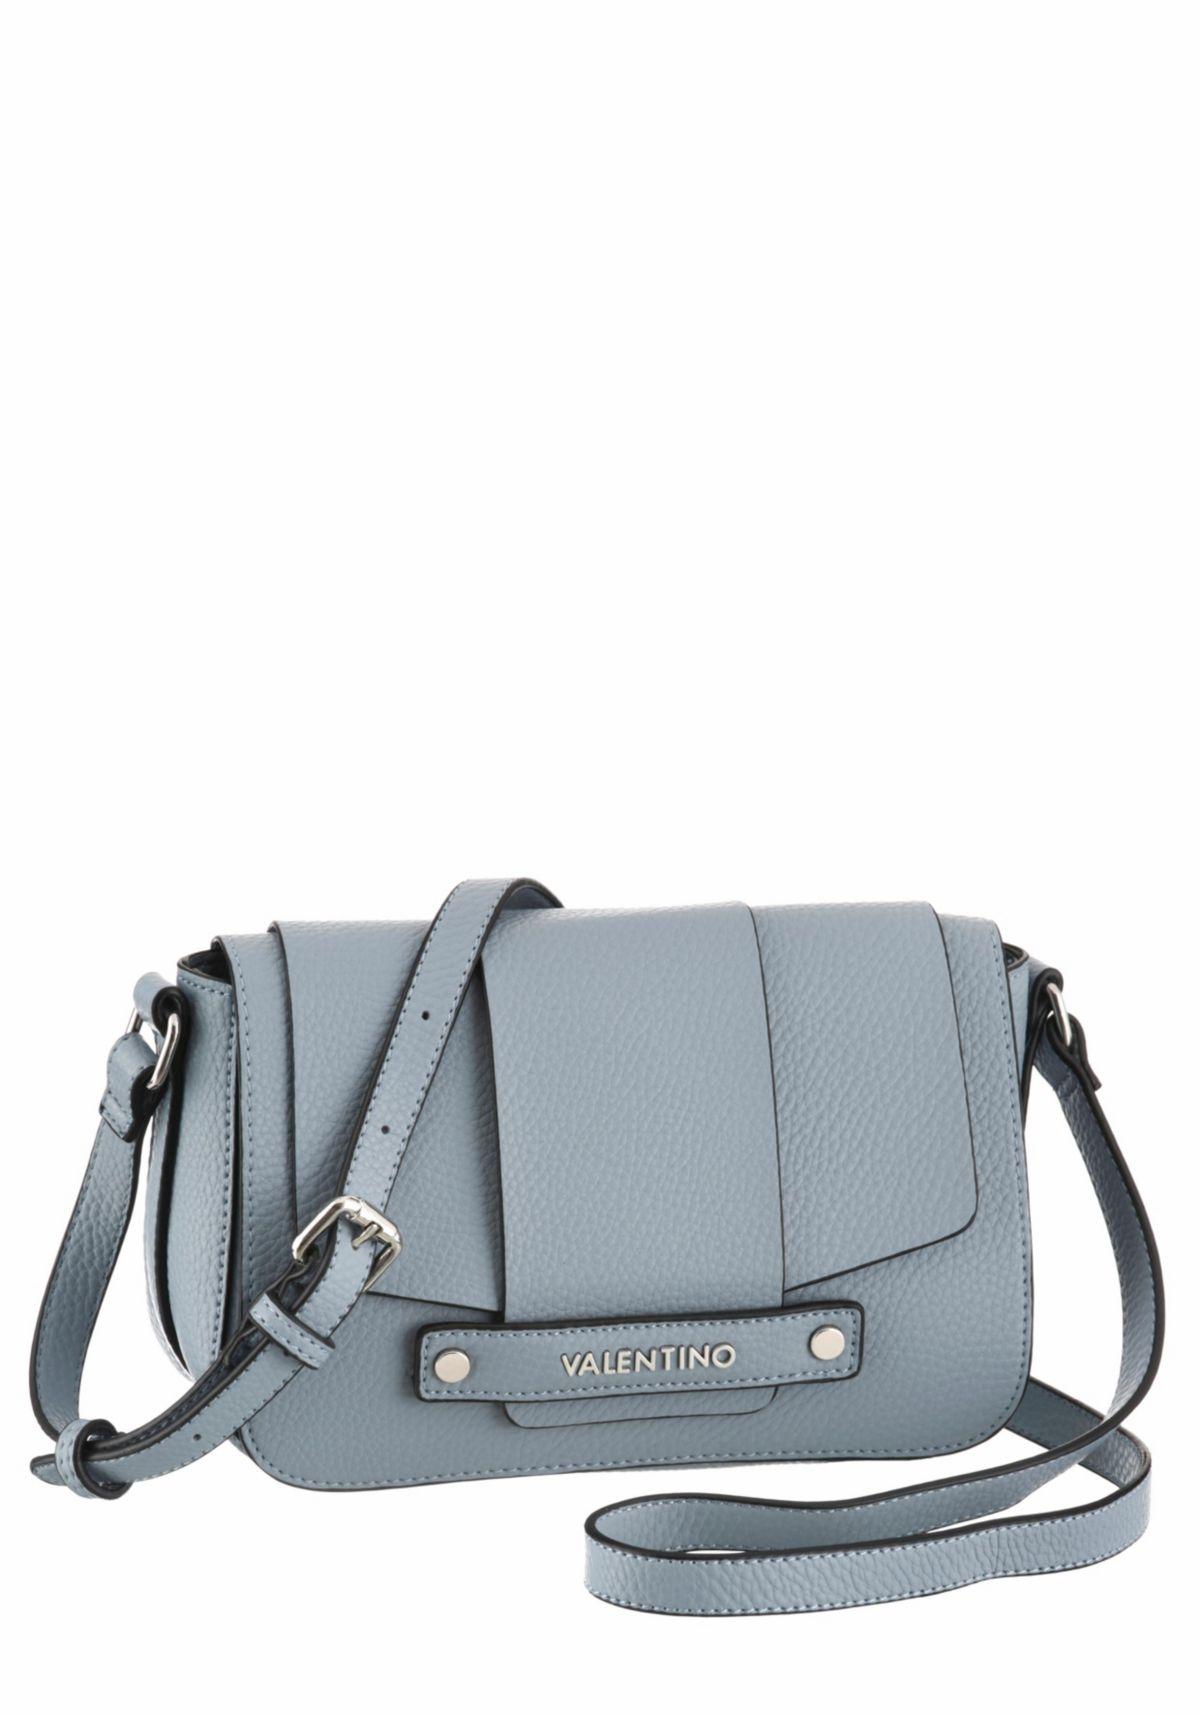 Valentino handbags Umhängetasche »YACHT«